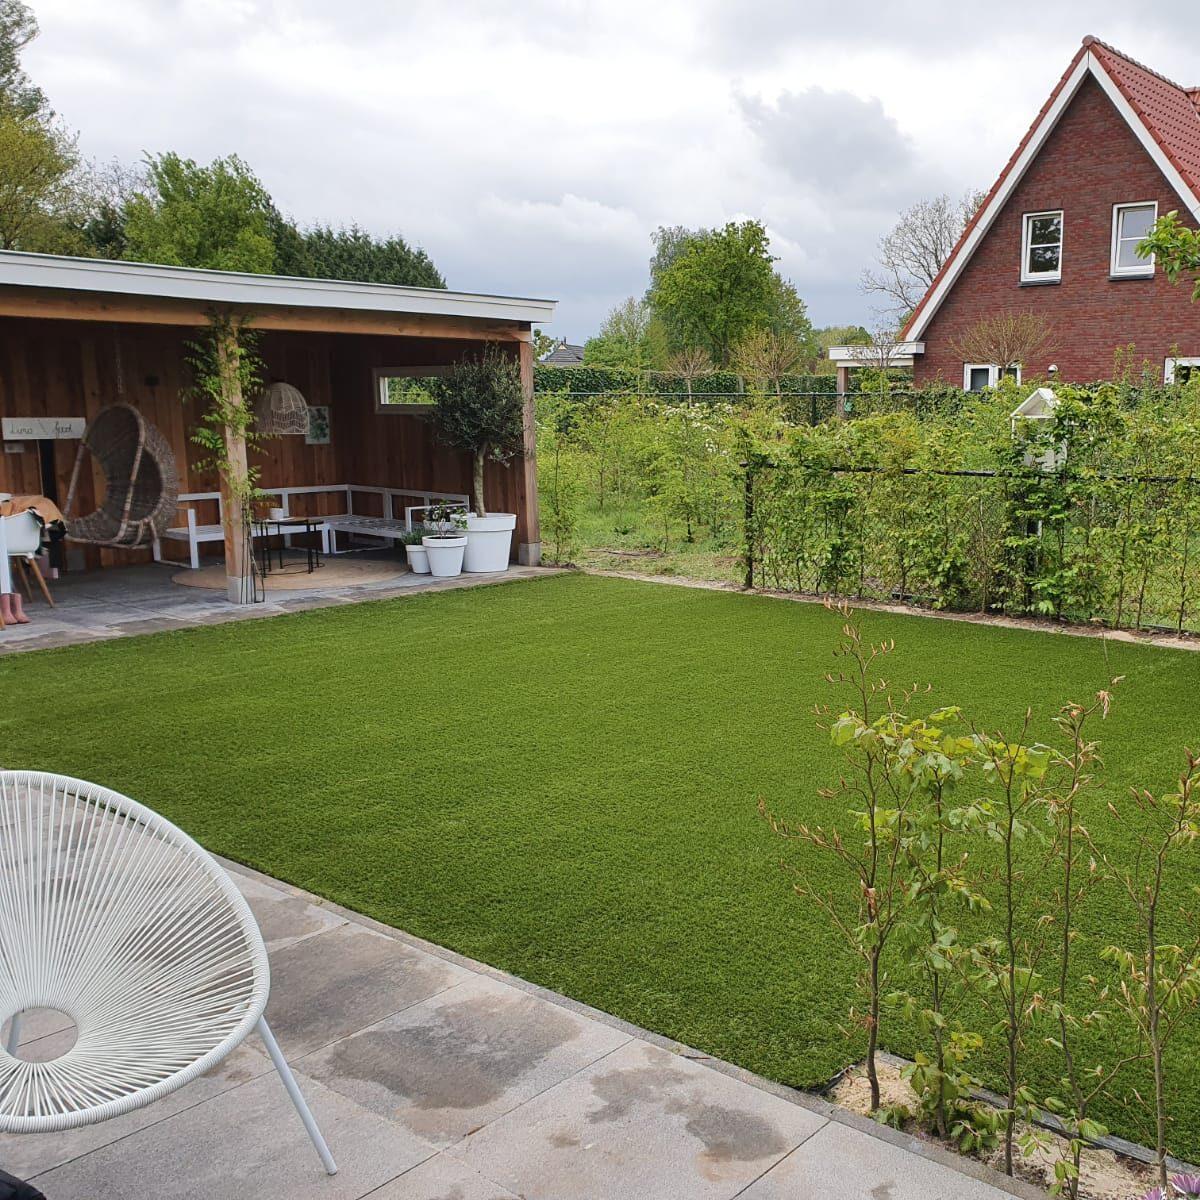 tivoli kunstgras tuin met overkapping